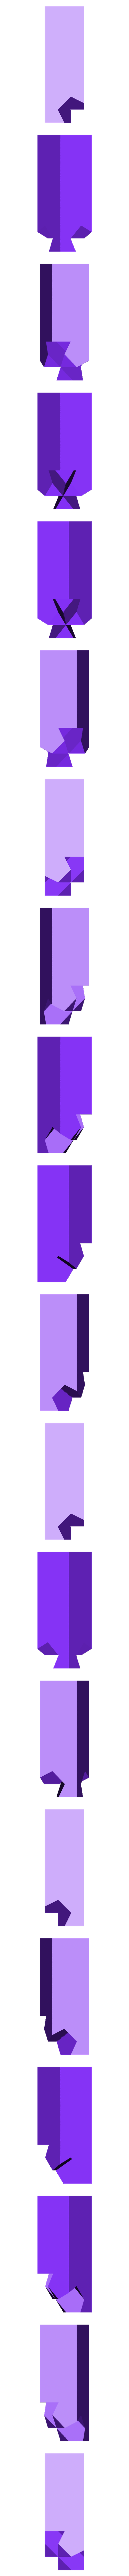 3way_joint_5cm_head_x10cm_leg.stl Download free STL file 3way joint_(Kawai Tsugite) • 3D print template, Fricis